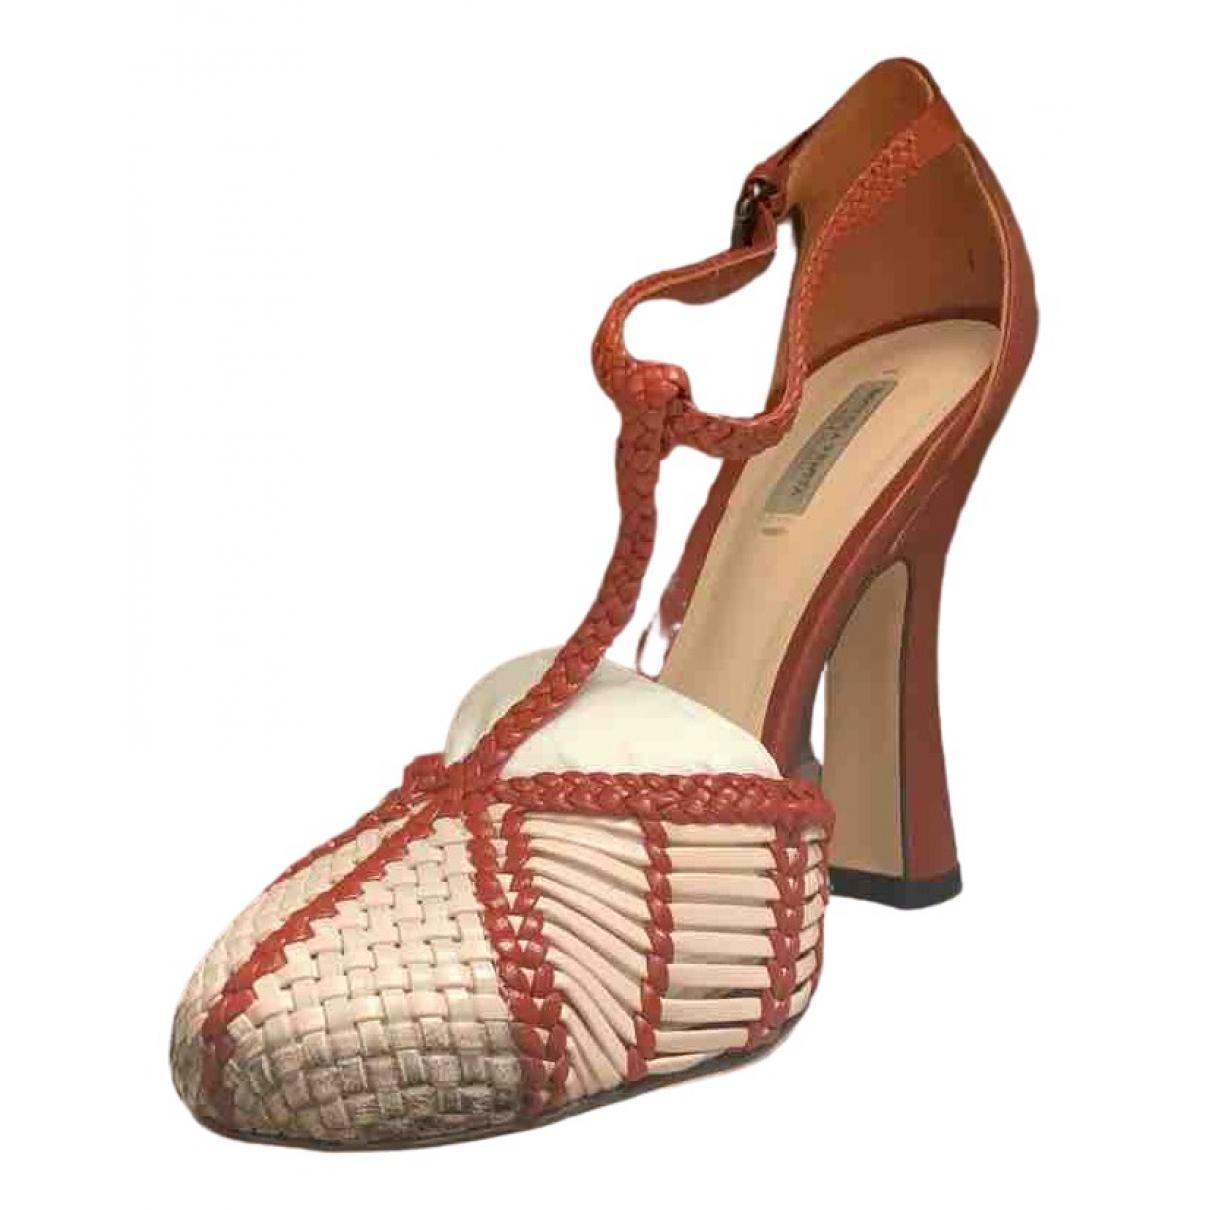 Bottega Veneta \N Red Leather Heels for Women 37 EU